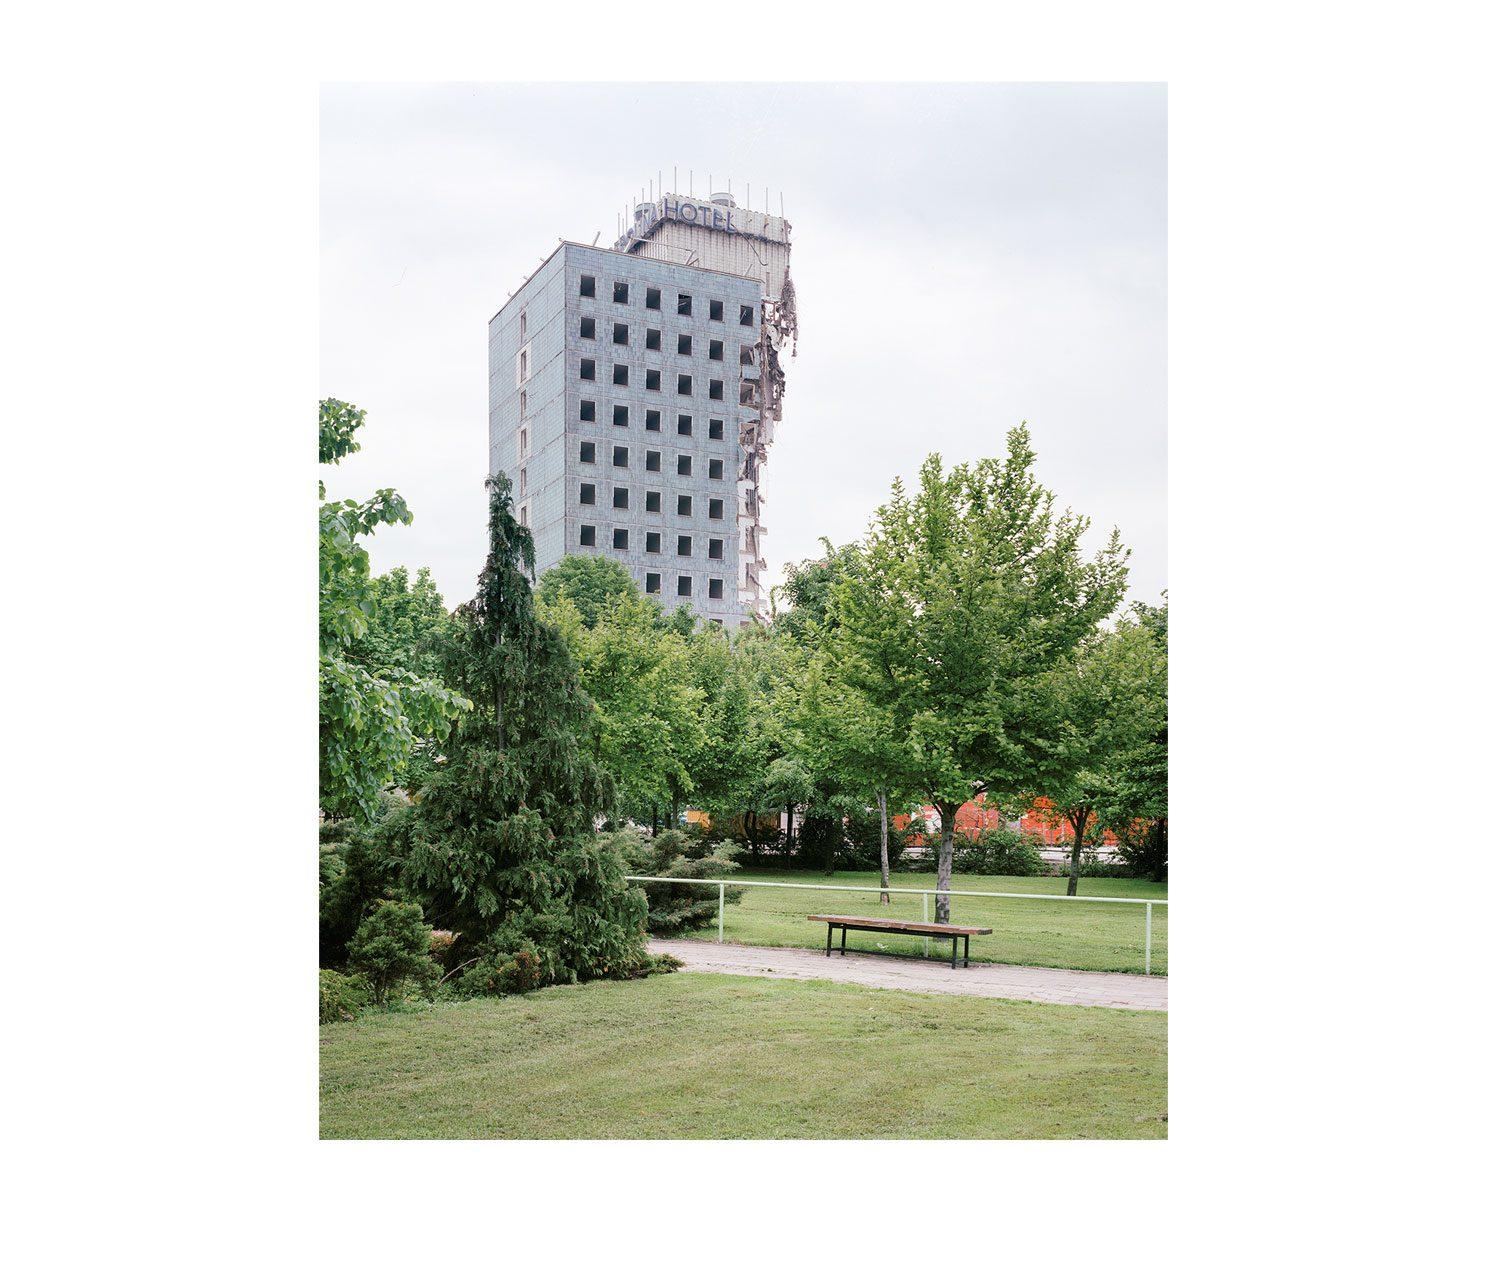 Stadt #17, Abriss, Hotel Berolina, 1996